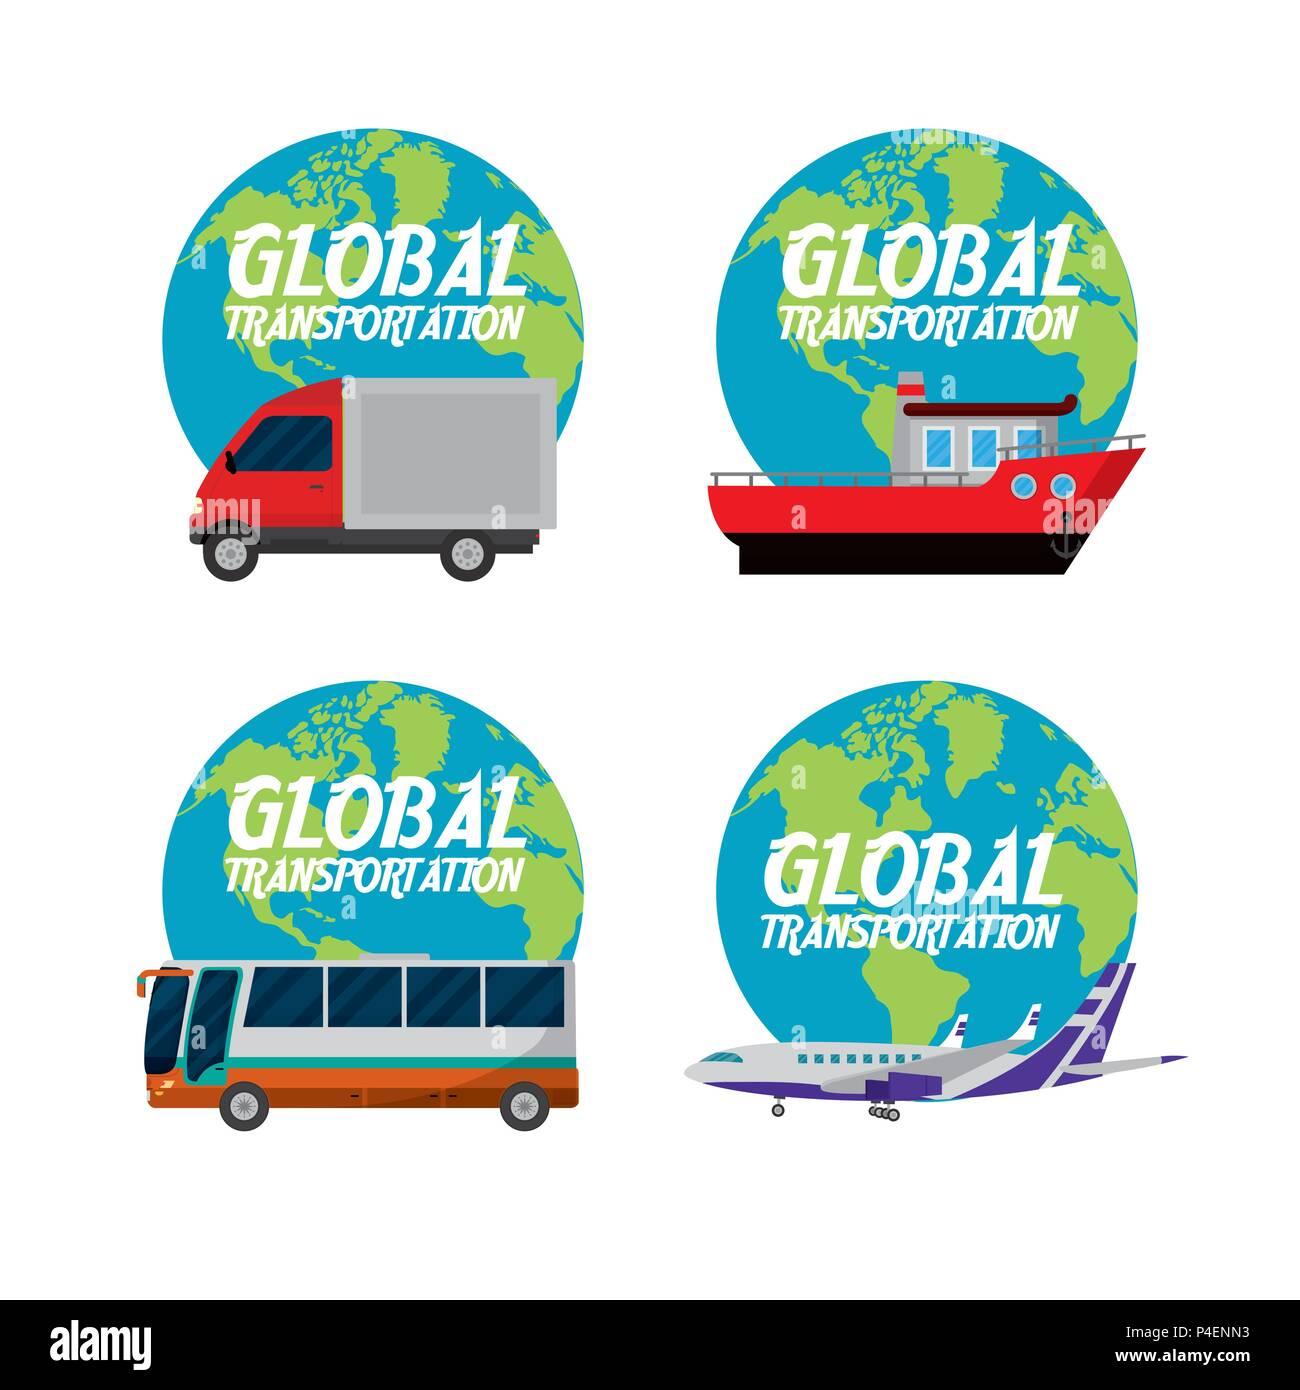 Global transport concept - Stock Image